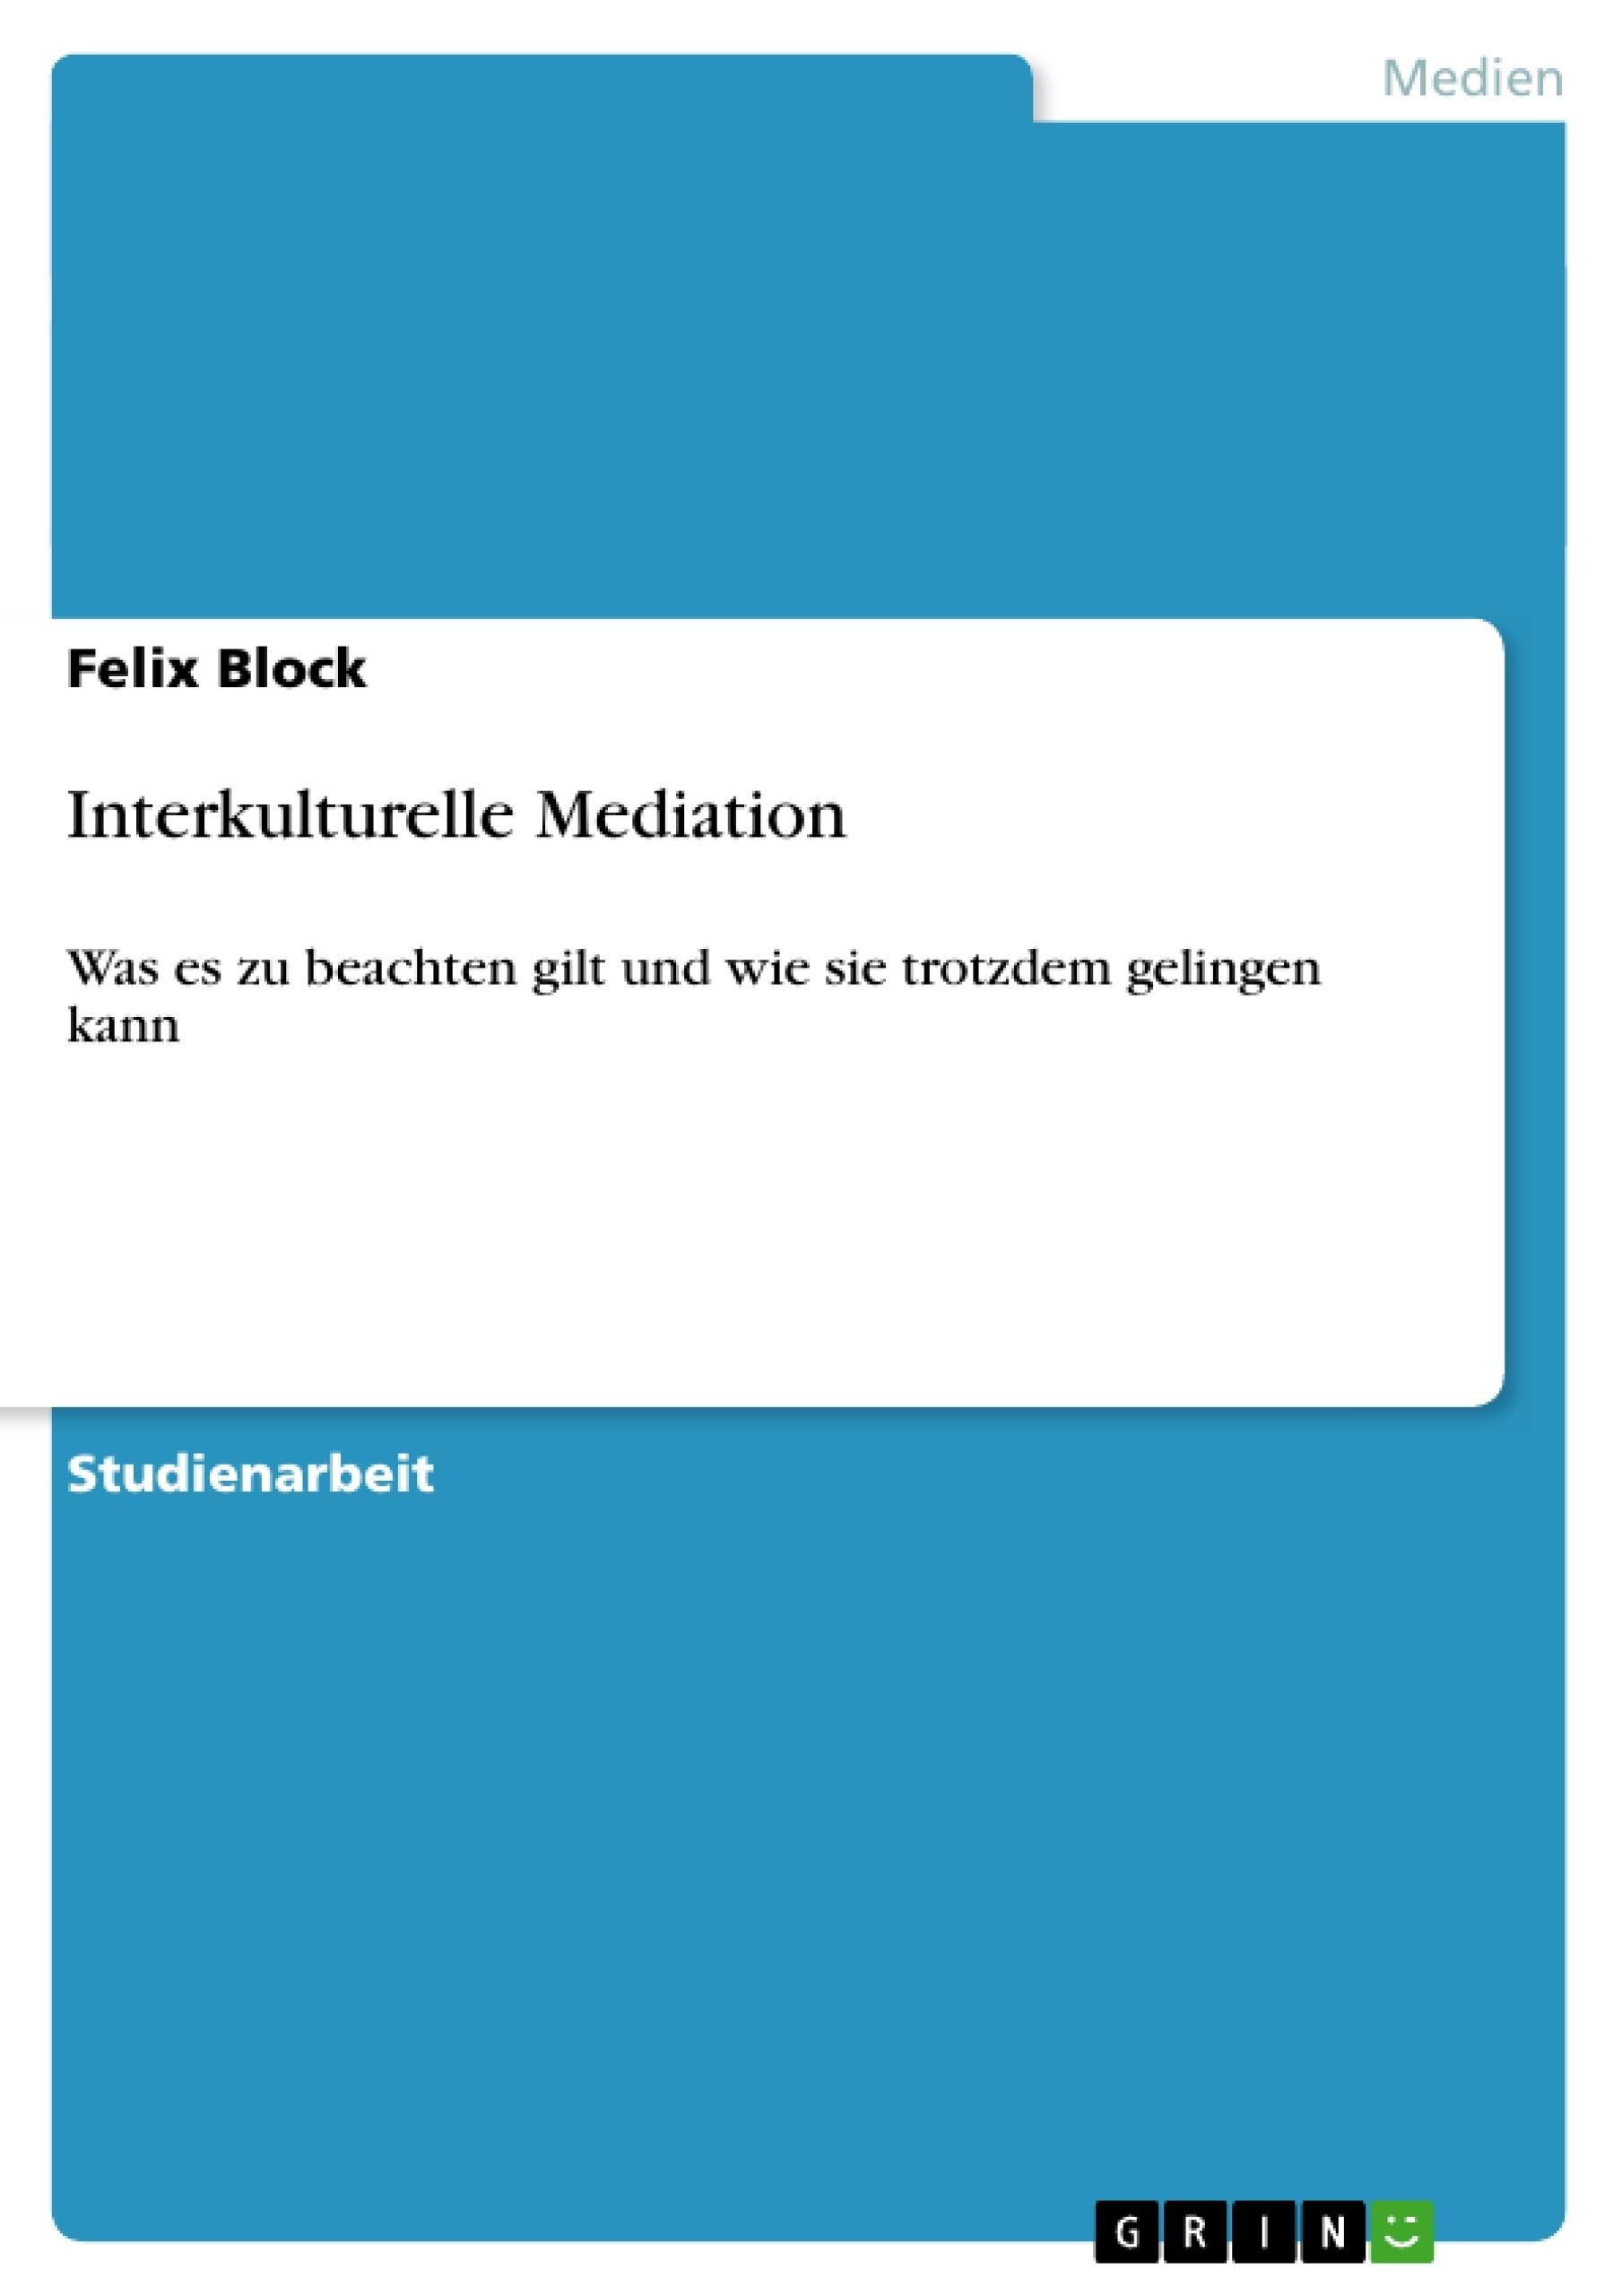 Titel: Interkulturelle Mediation